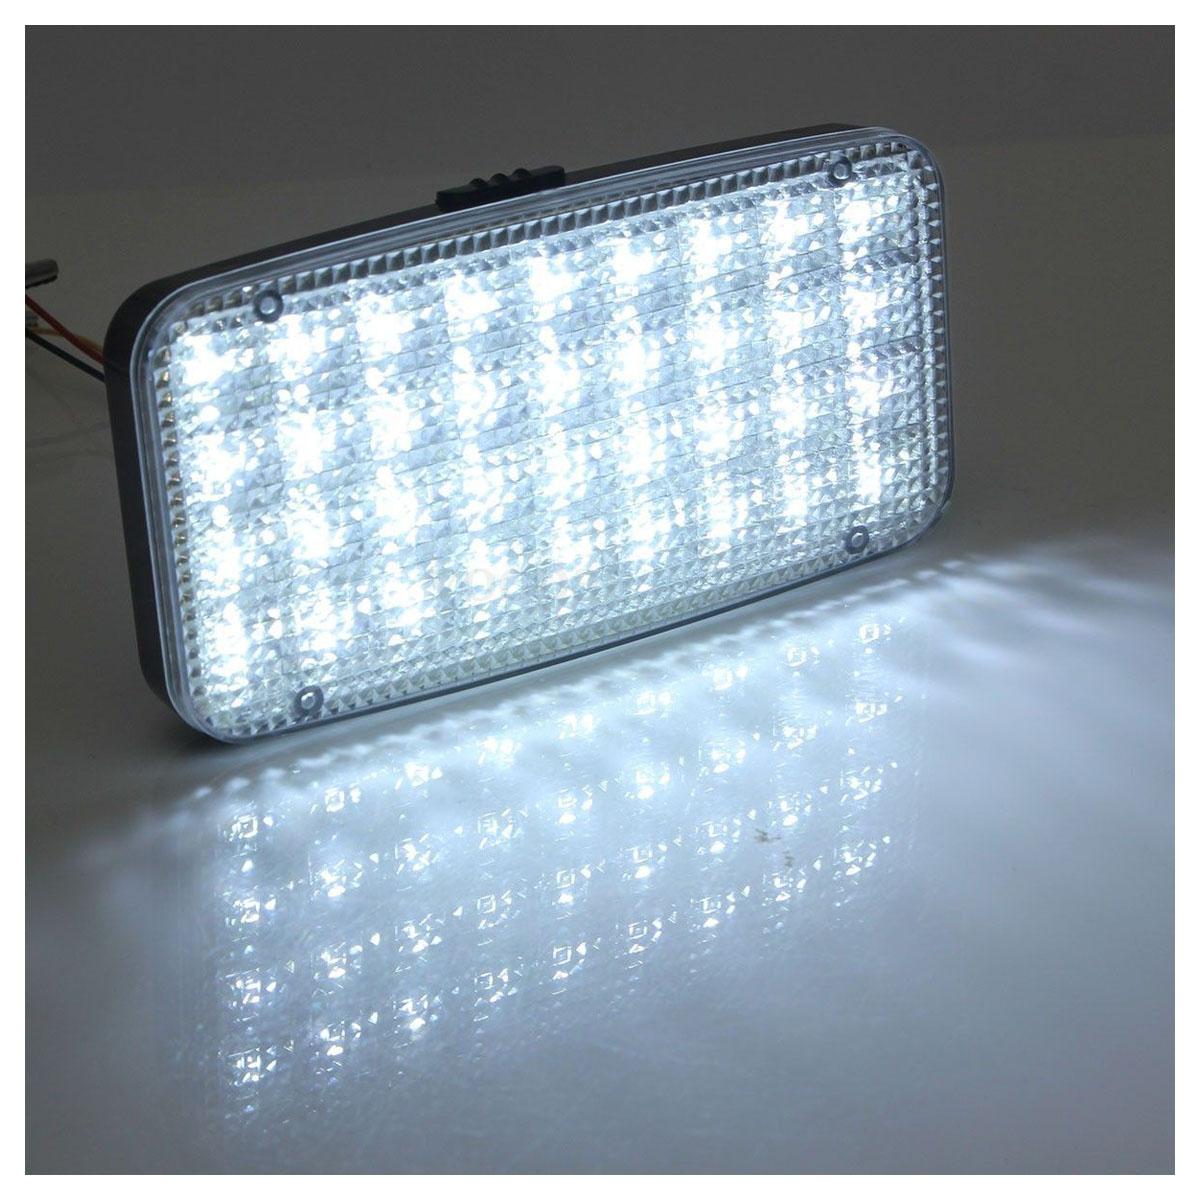 2 pc 12v 36 led light bright white auto van trunk roof. Black Bedroom Furniture Sets. Home Design Ideas